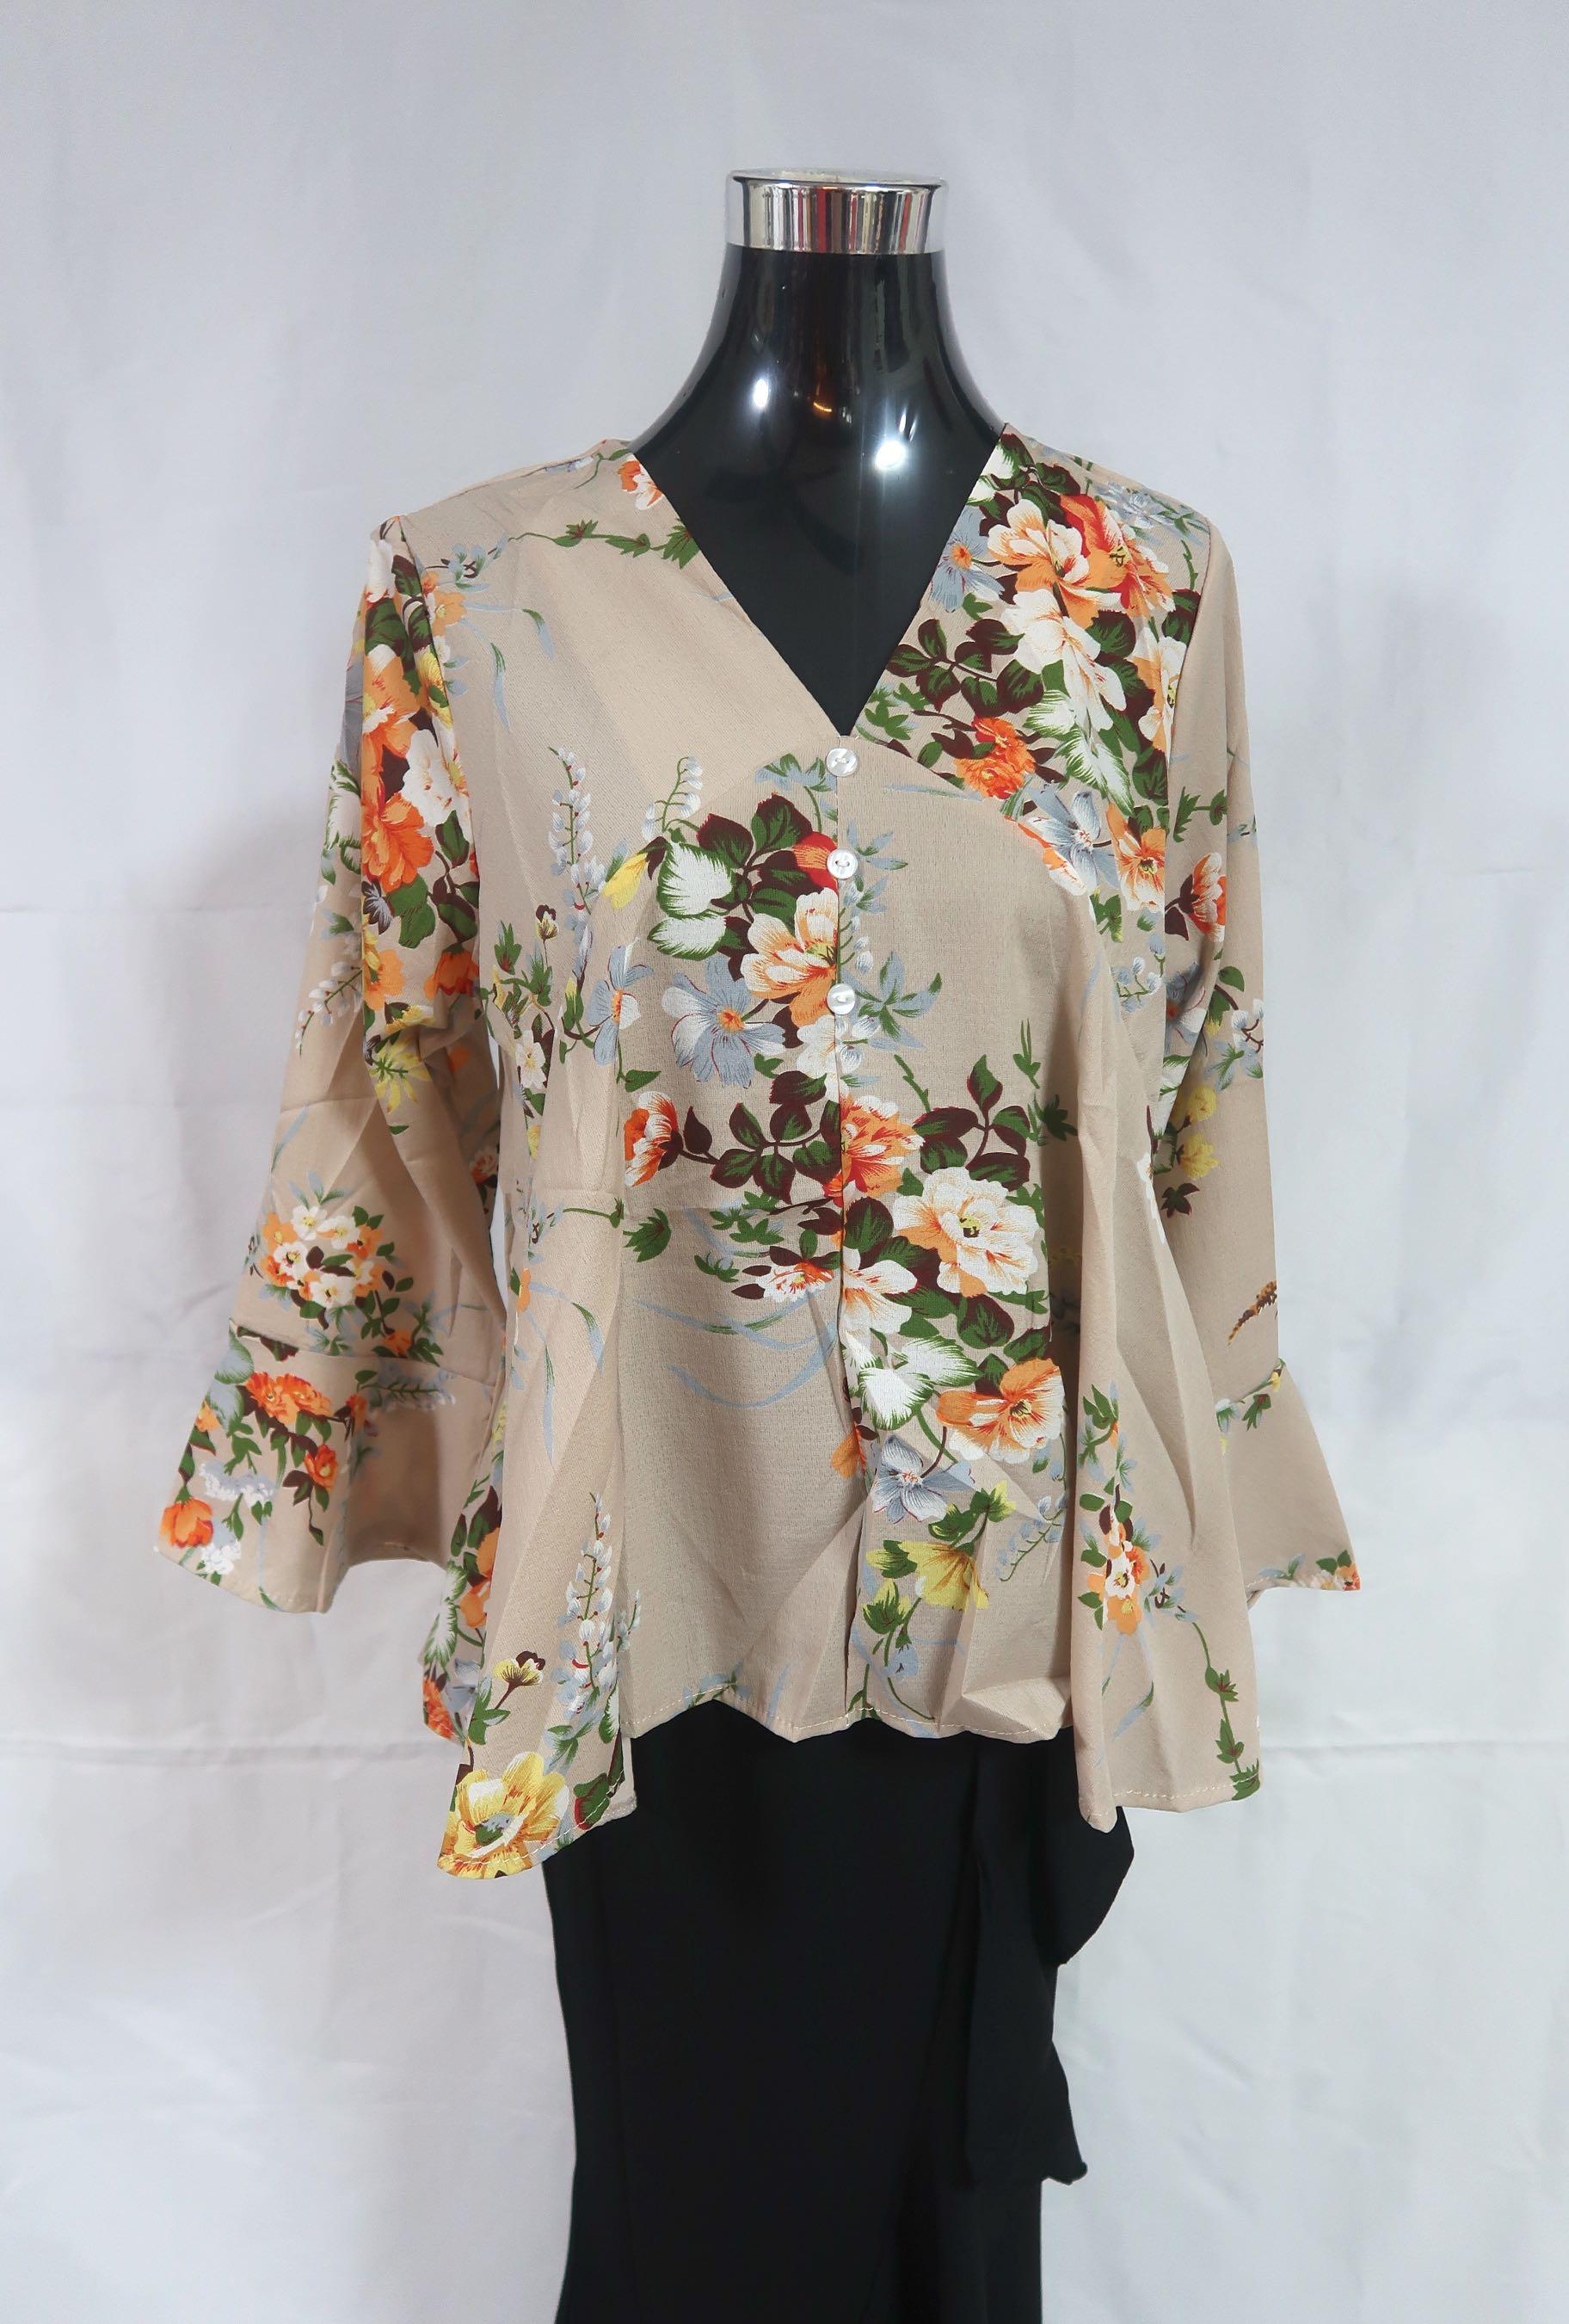 Modern clothings for pretty ladies!